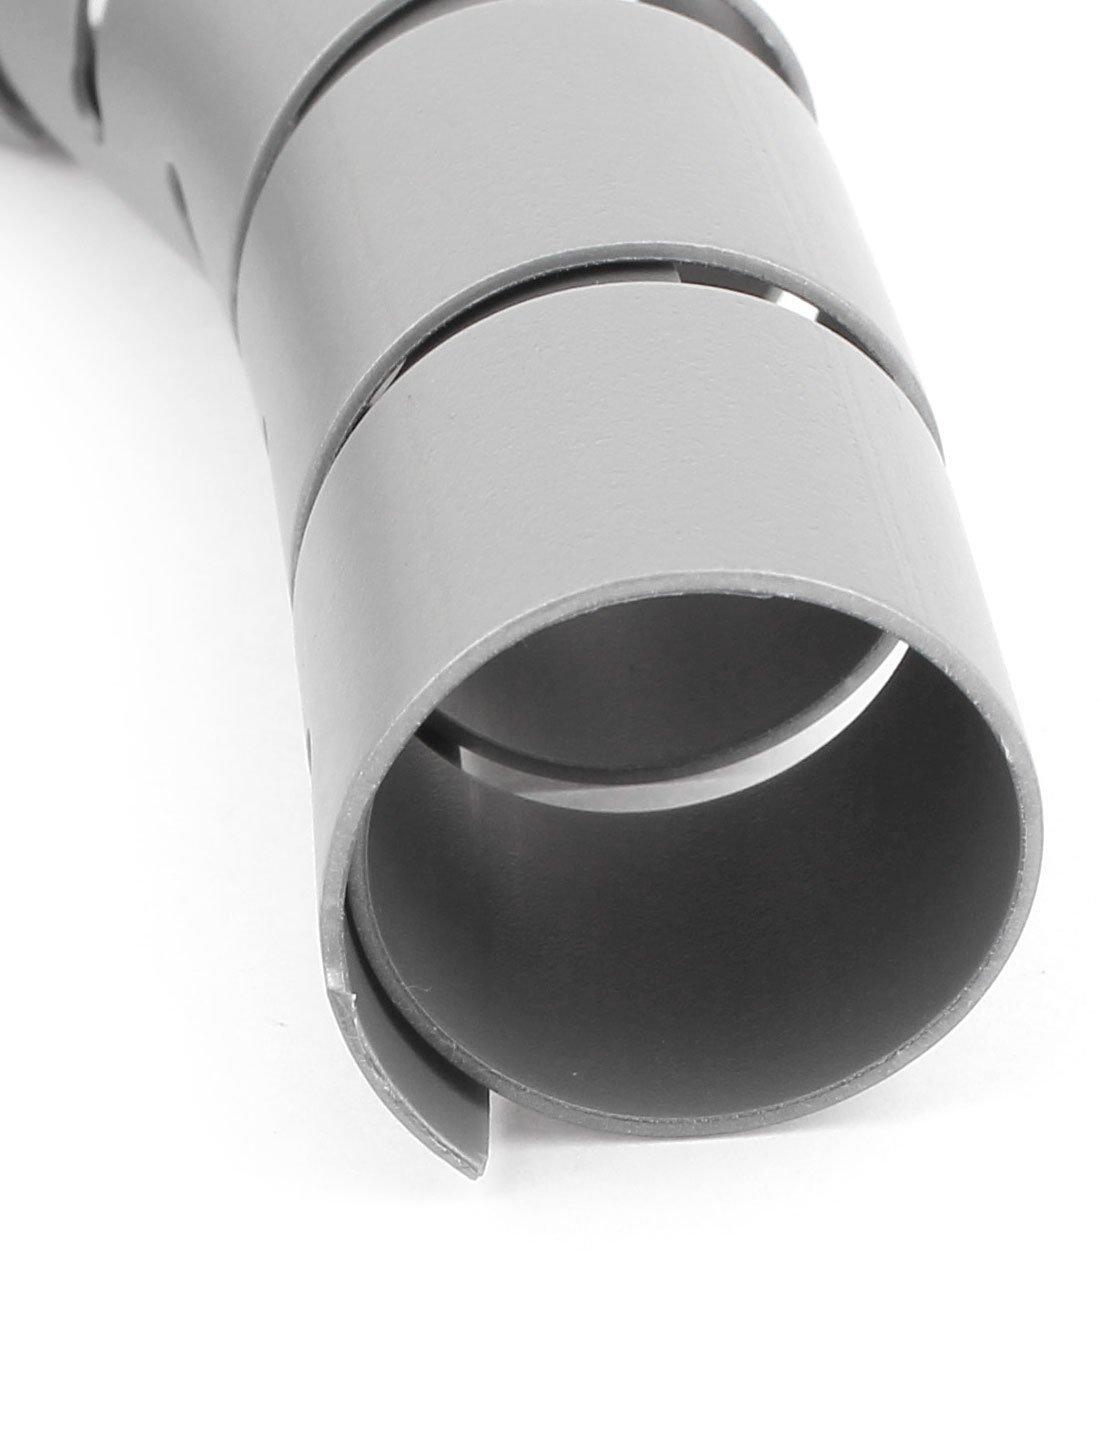 Tube Spiral Cable Wire Wrap Organizer Gestion des c/âbles 40mmx2m gris